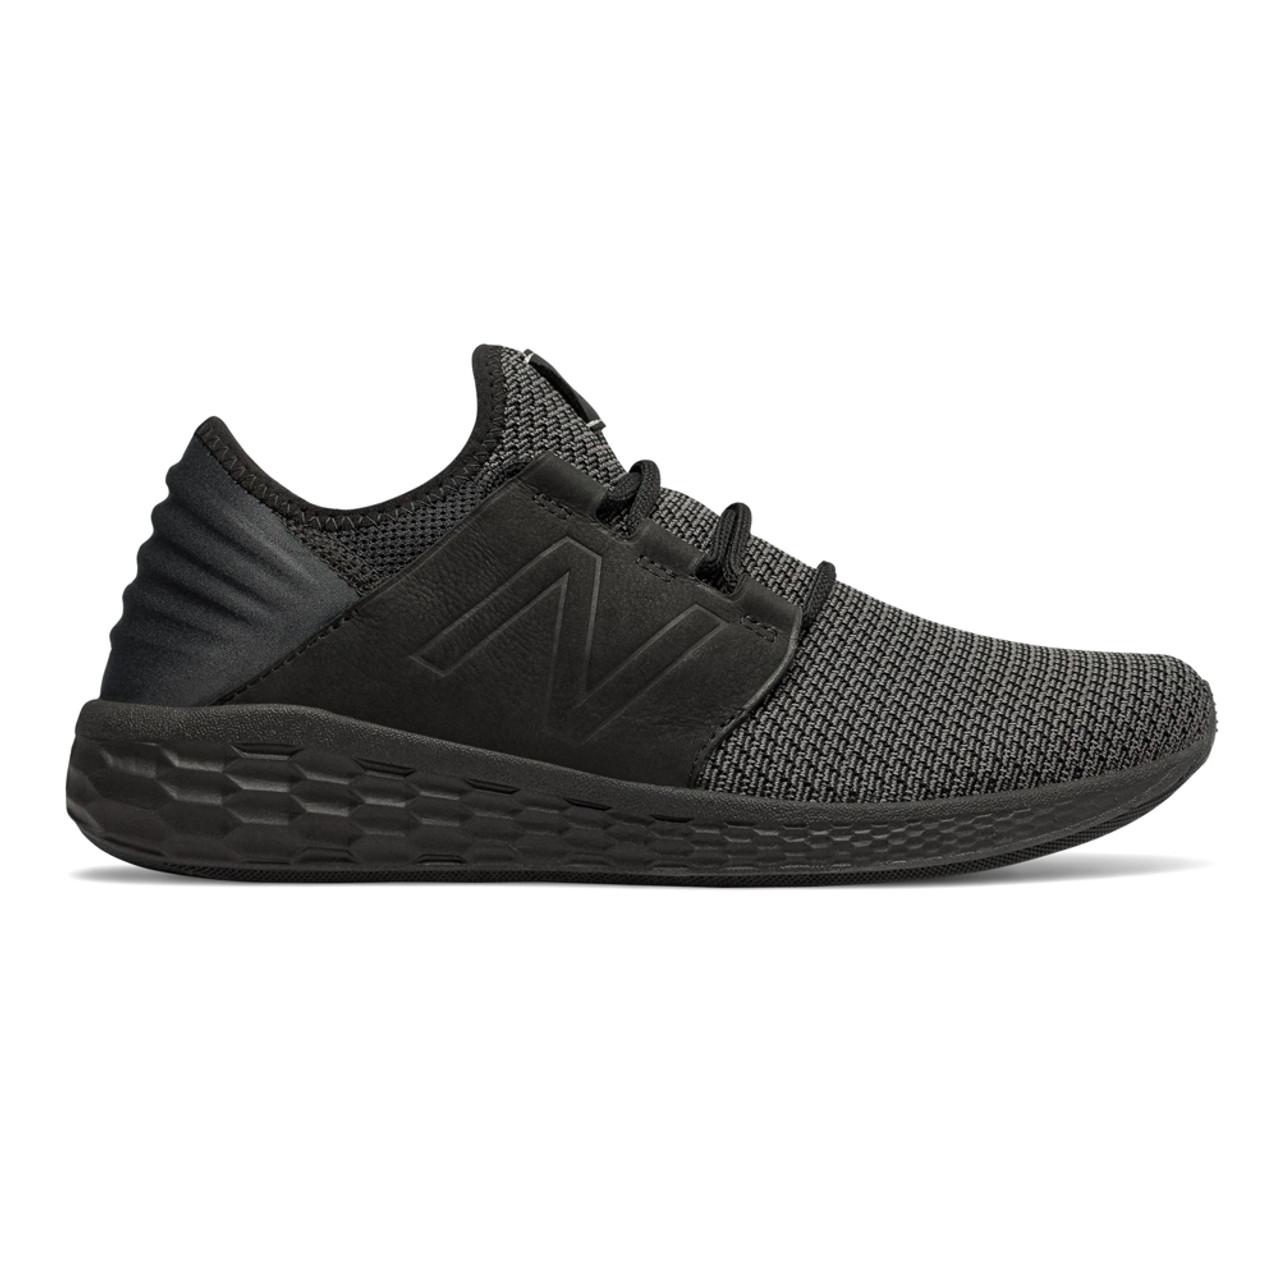 d5c25feebacac New Balance Men's MCRUZNB2 Running Shoe Black/Magnet - Shop now @ Shoolu.com